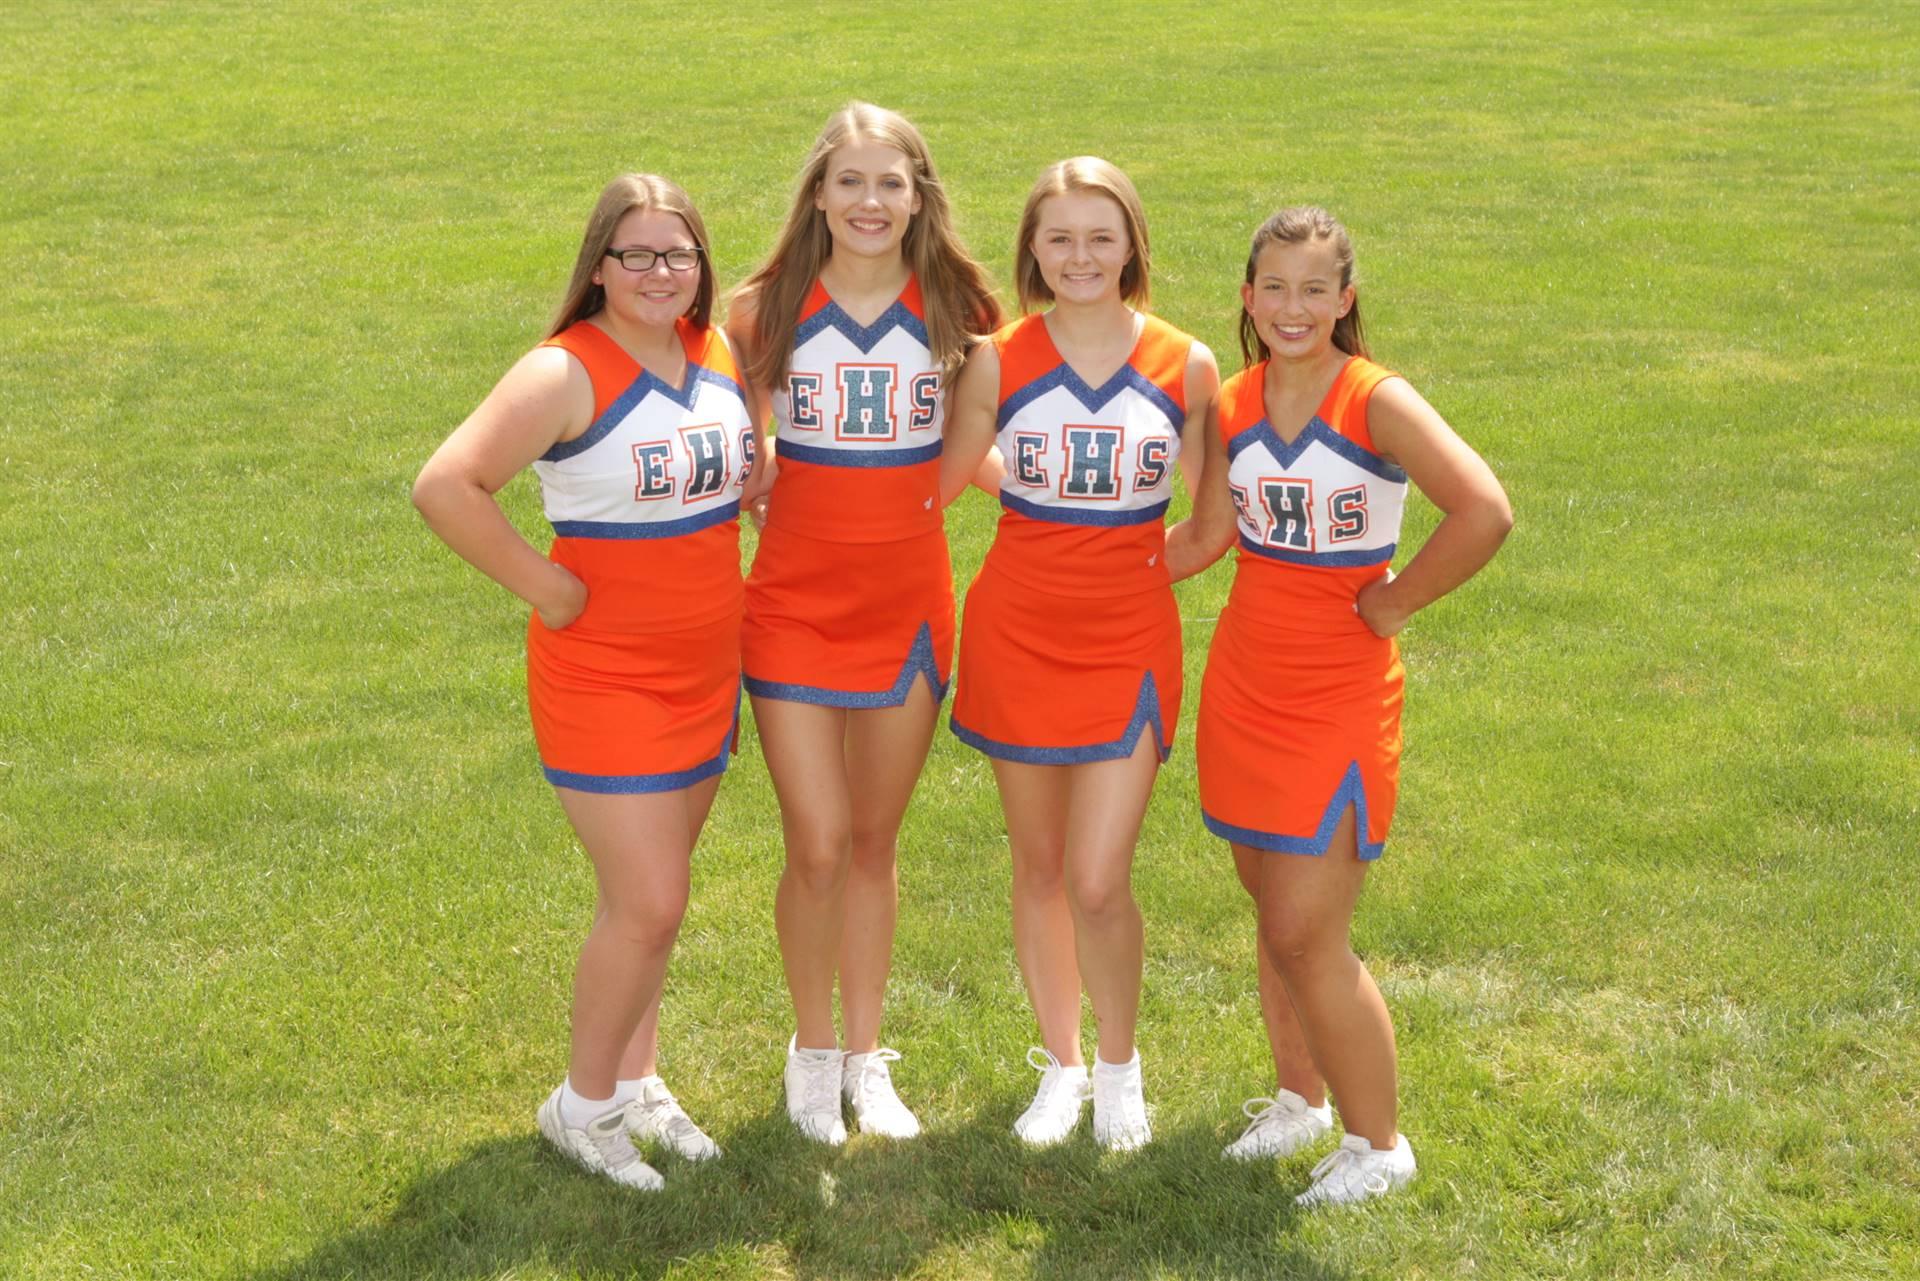 2019 Fall Cheerleader Photos